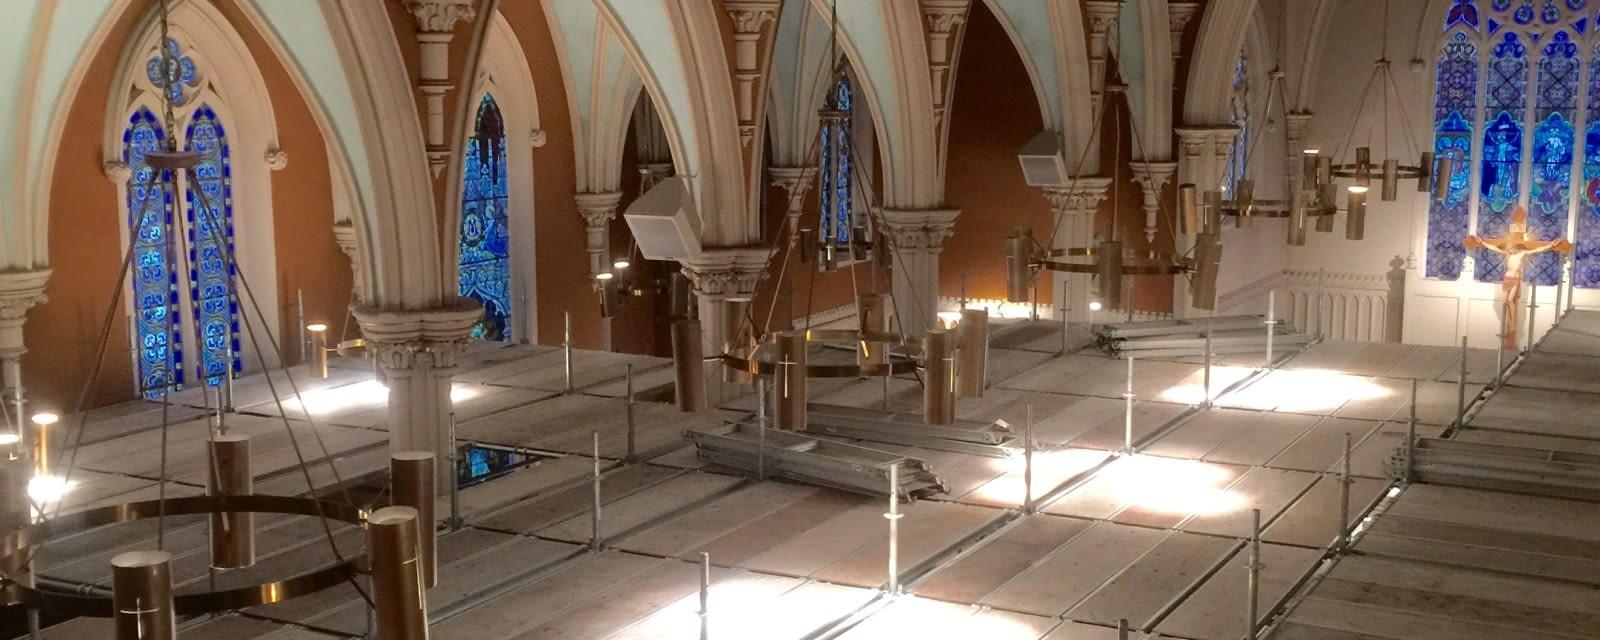 Our approach - Interior of St. Joseph's Roman Catholic Church undergoing restoration in Stratford, Ontario